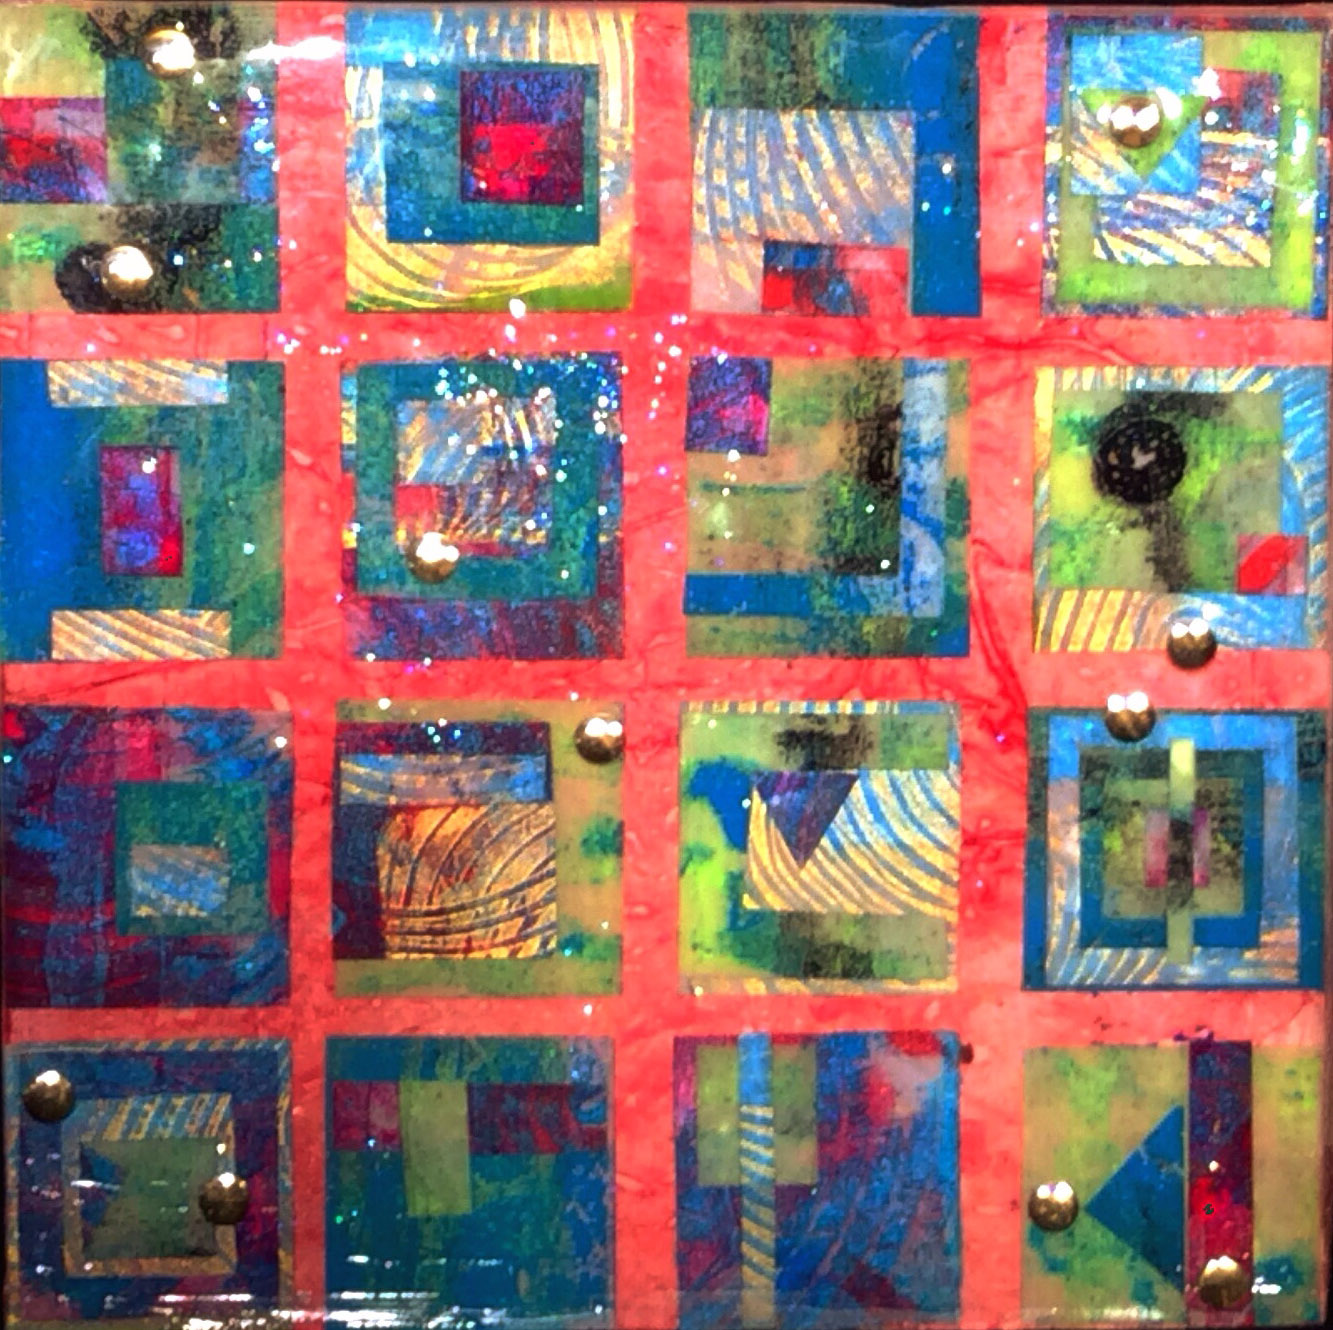 Work by Darlene Wilkinson (MG: April 2014)